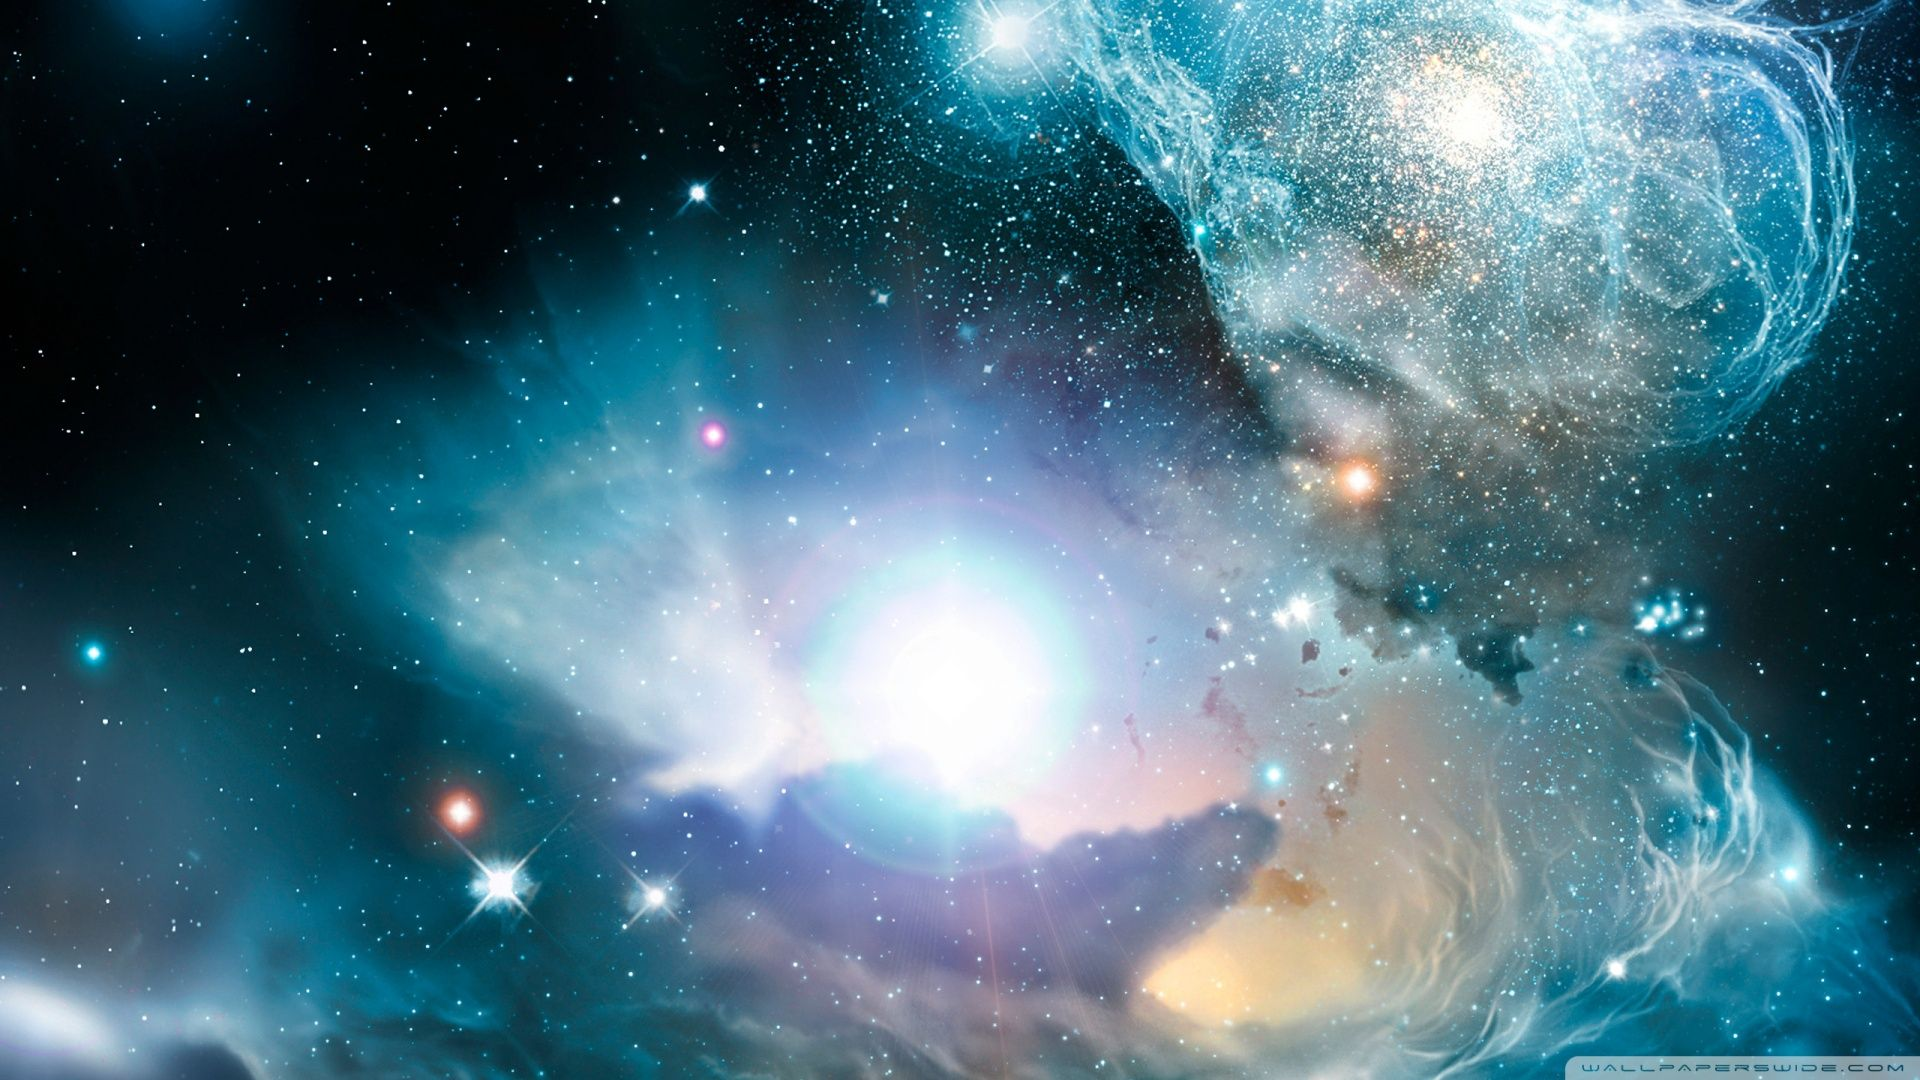 Astronomy desktop background free